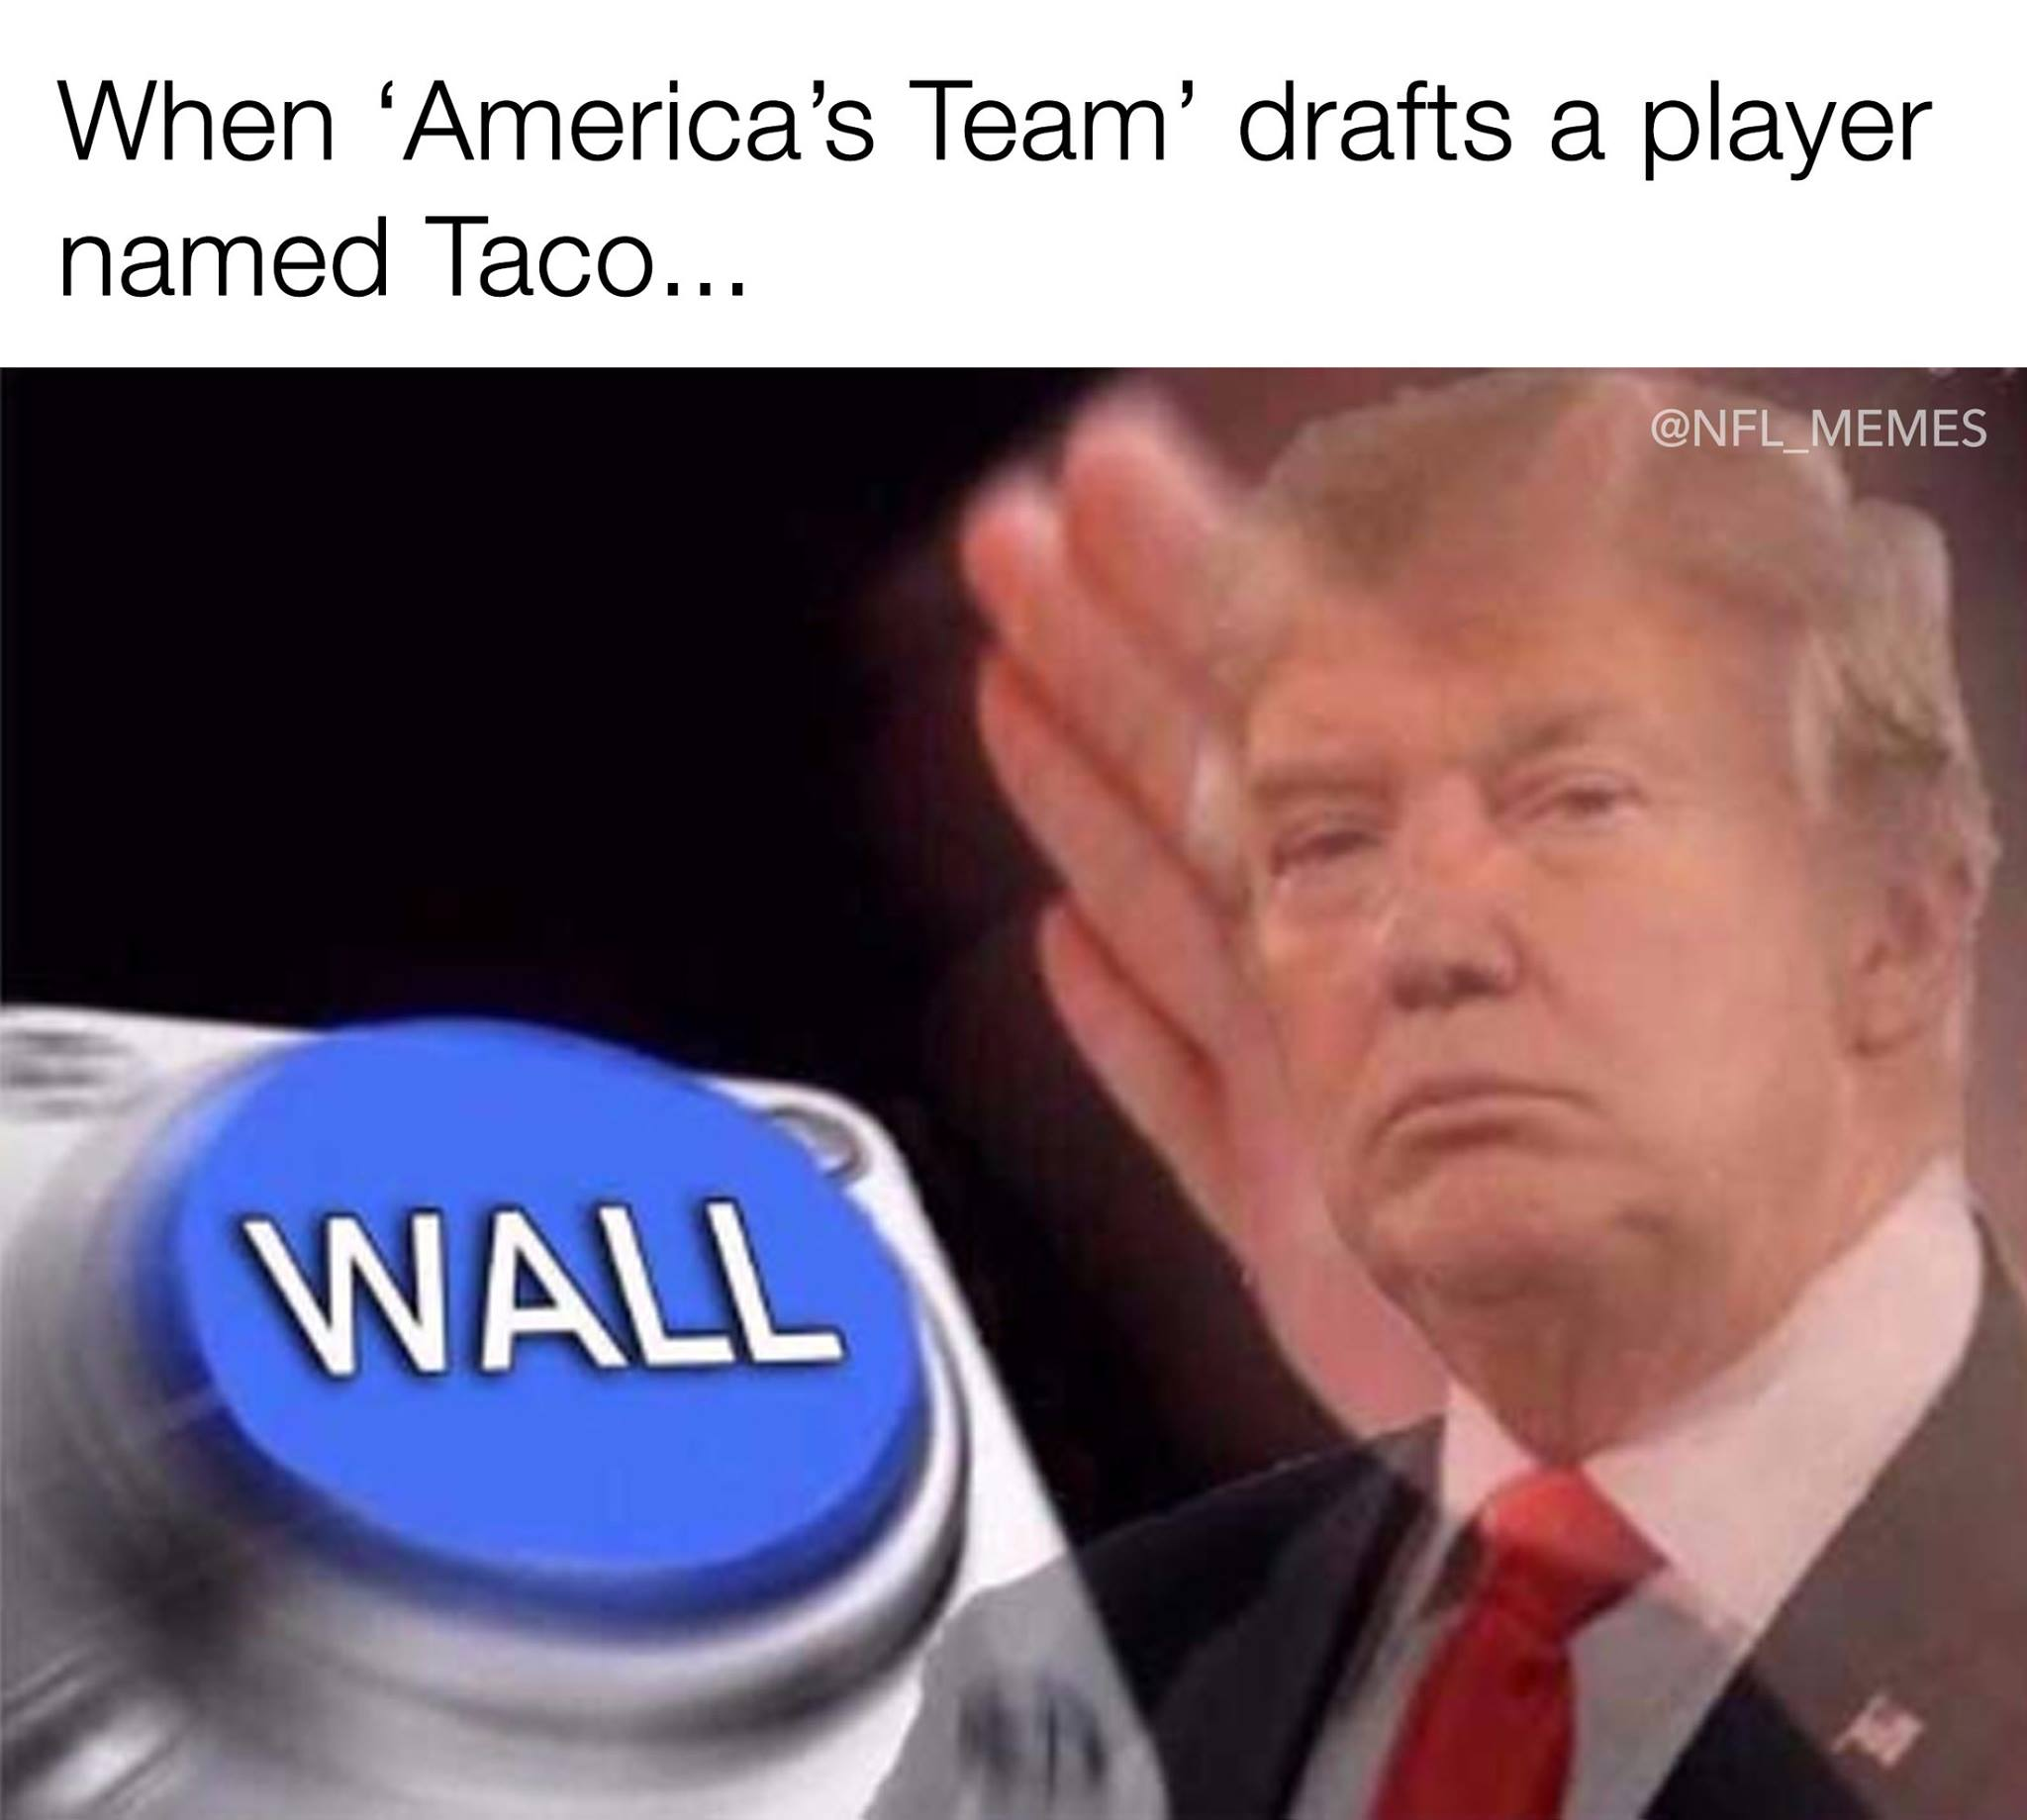 Share · worst trade deal meme